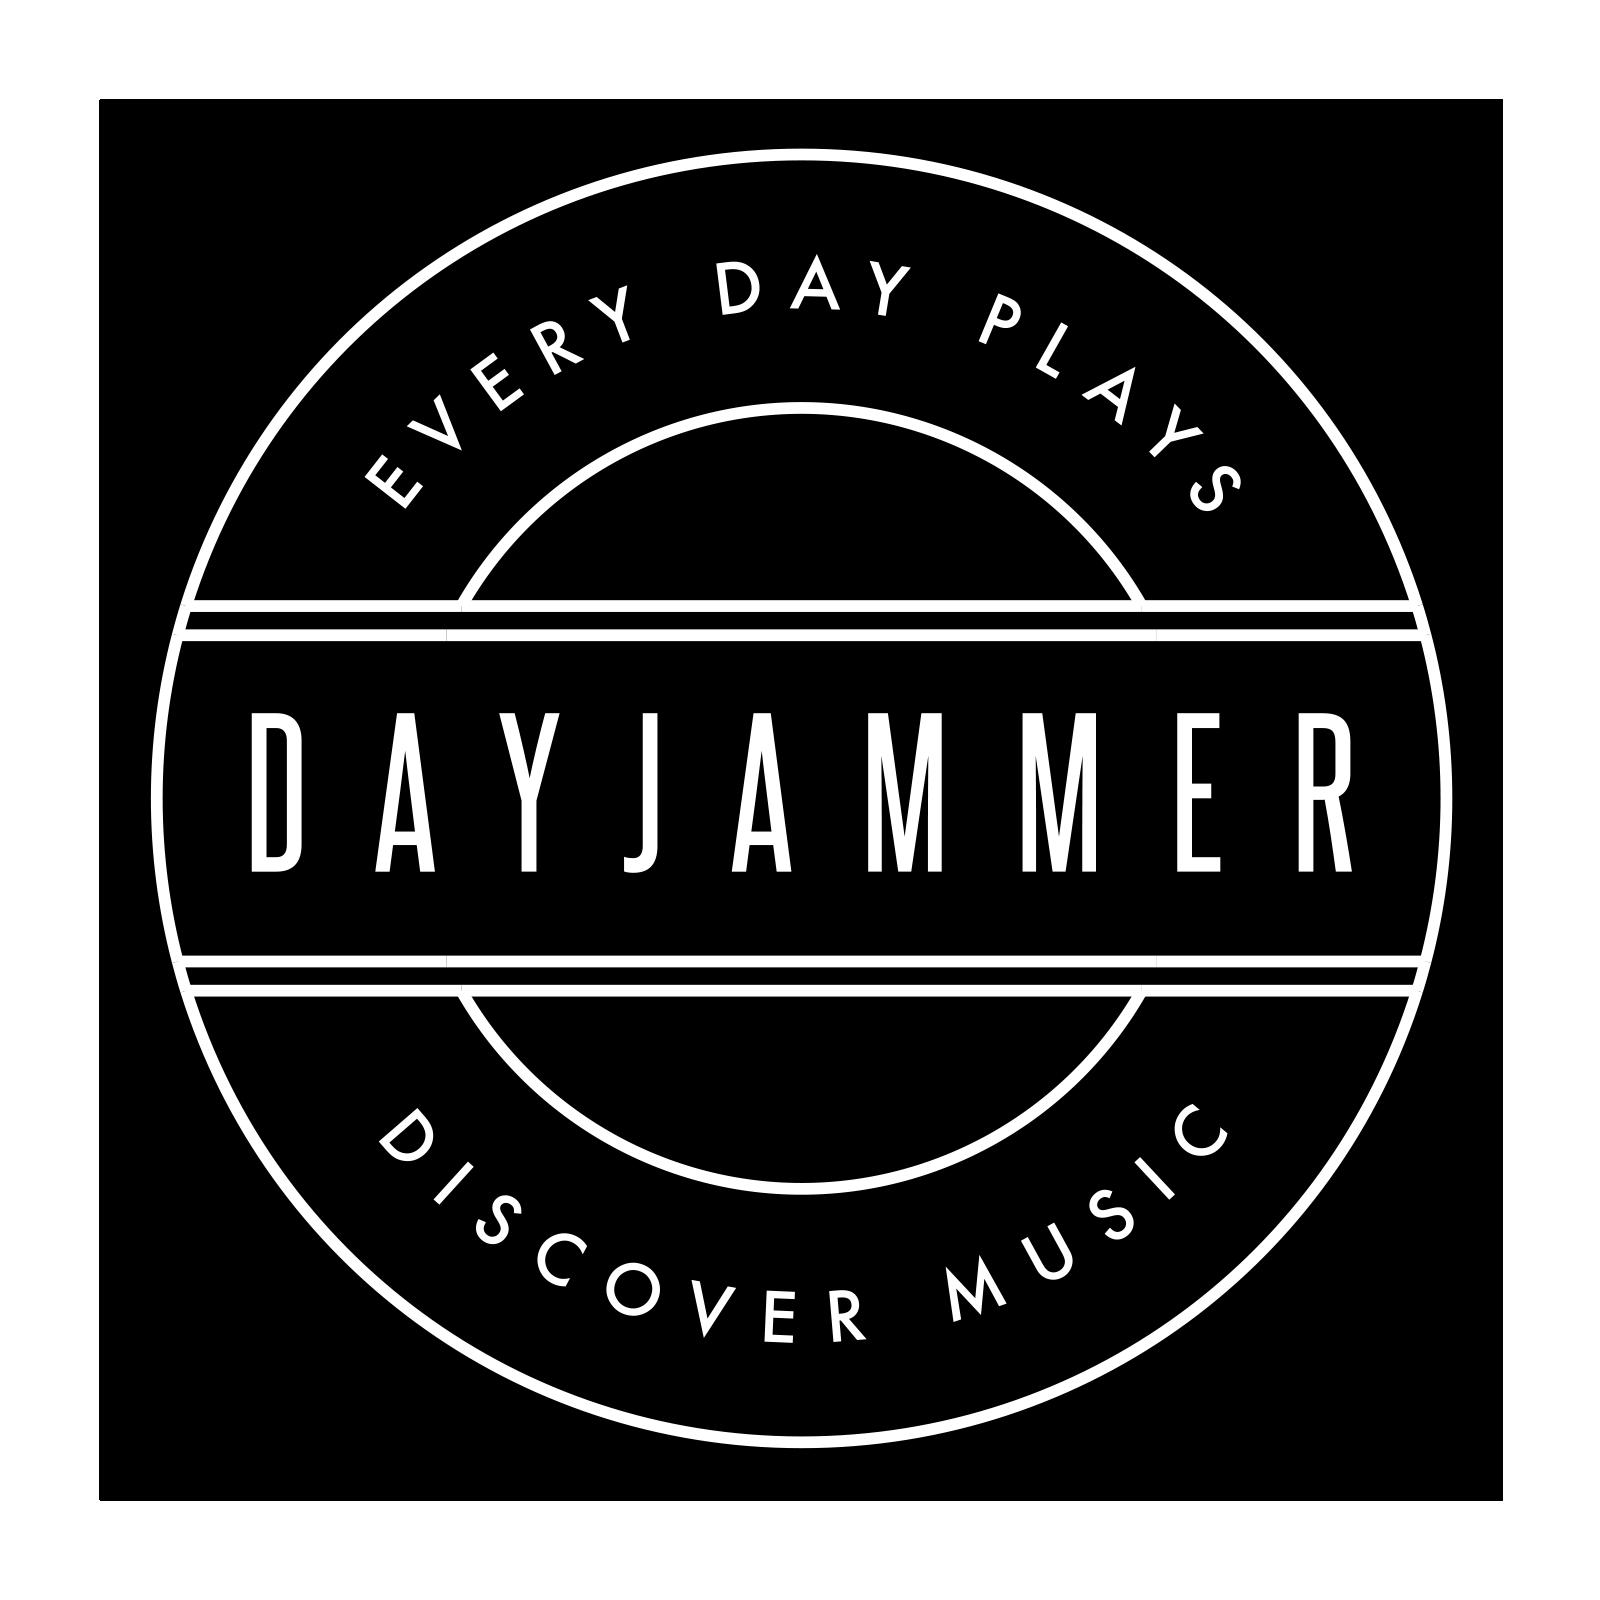 Dayjammer.com logo